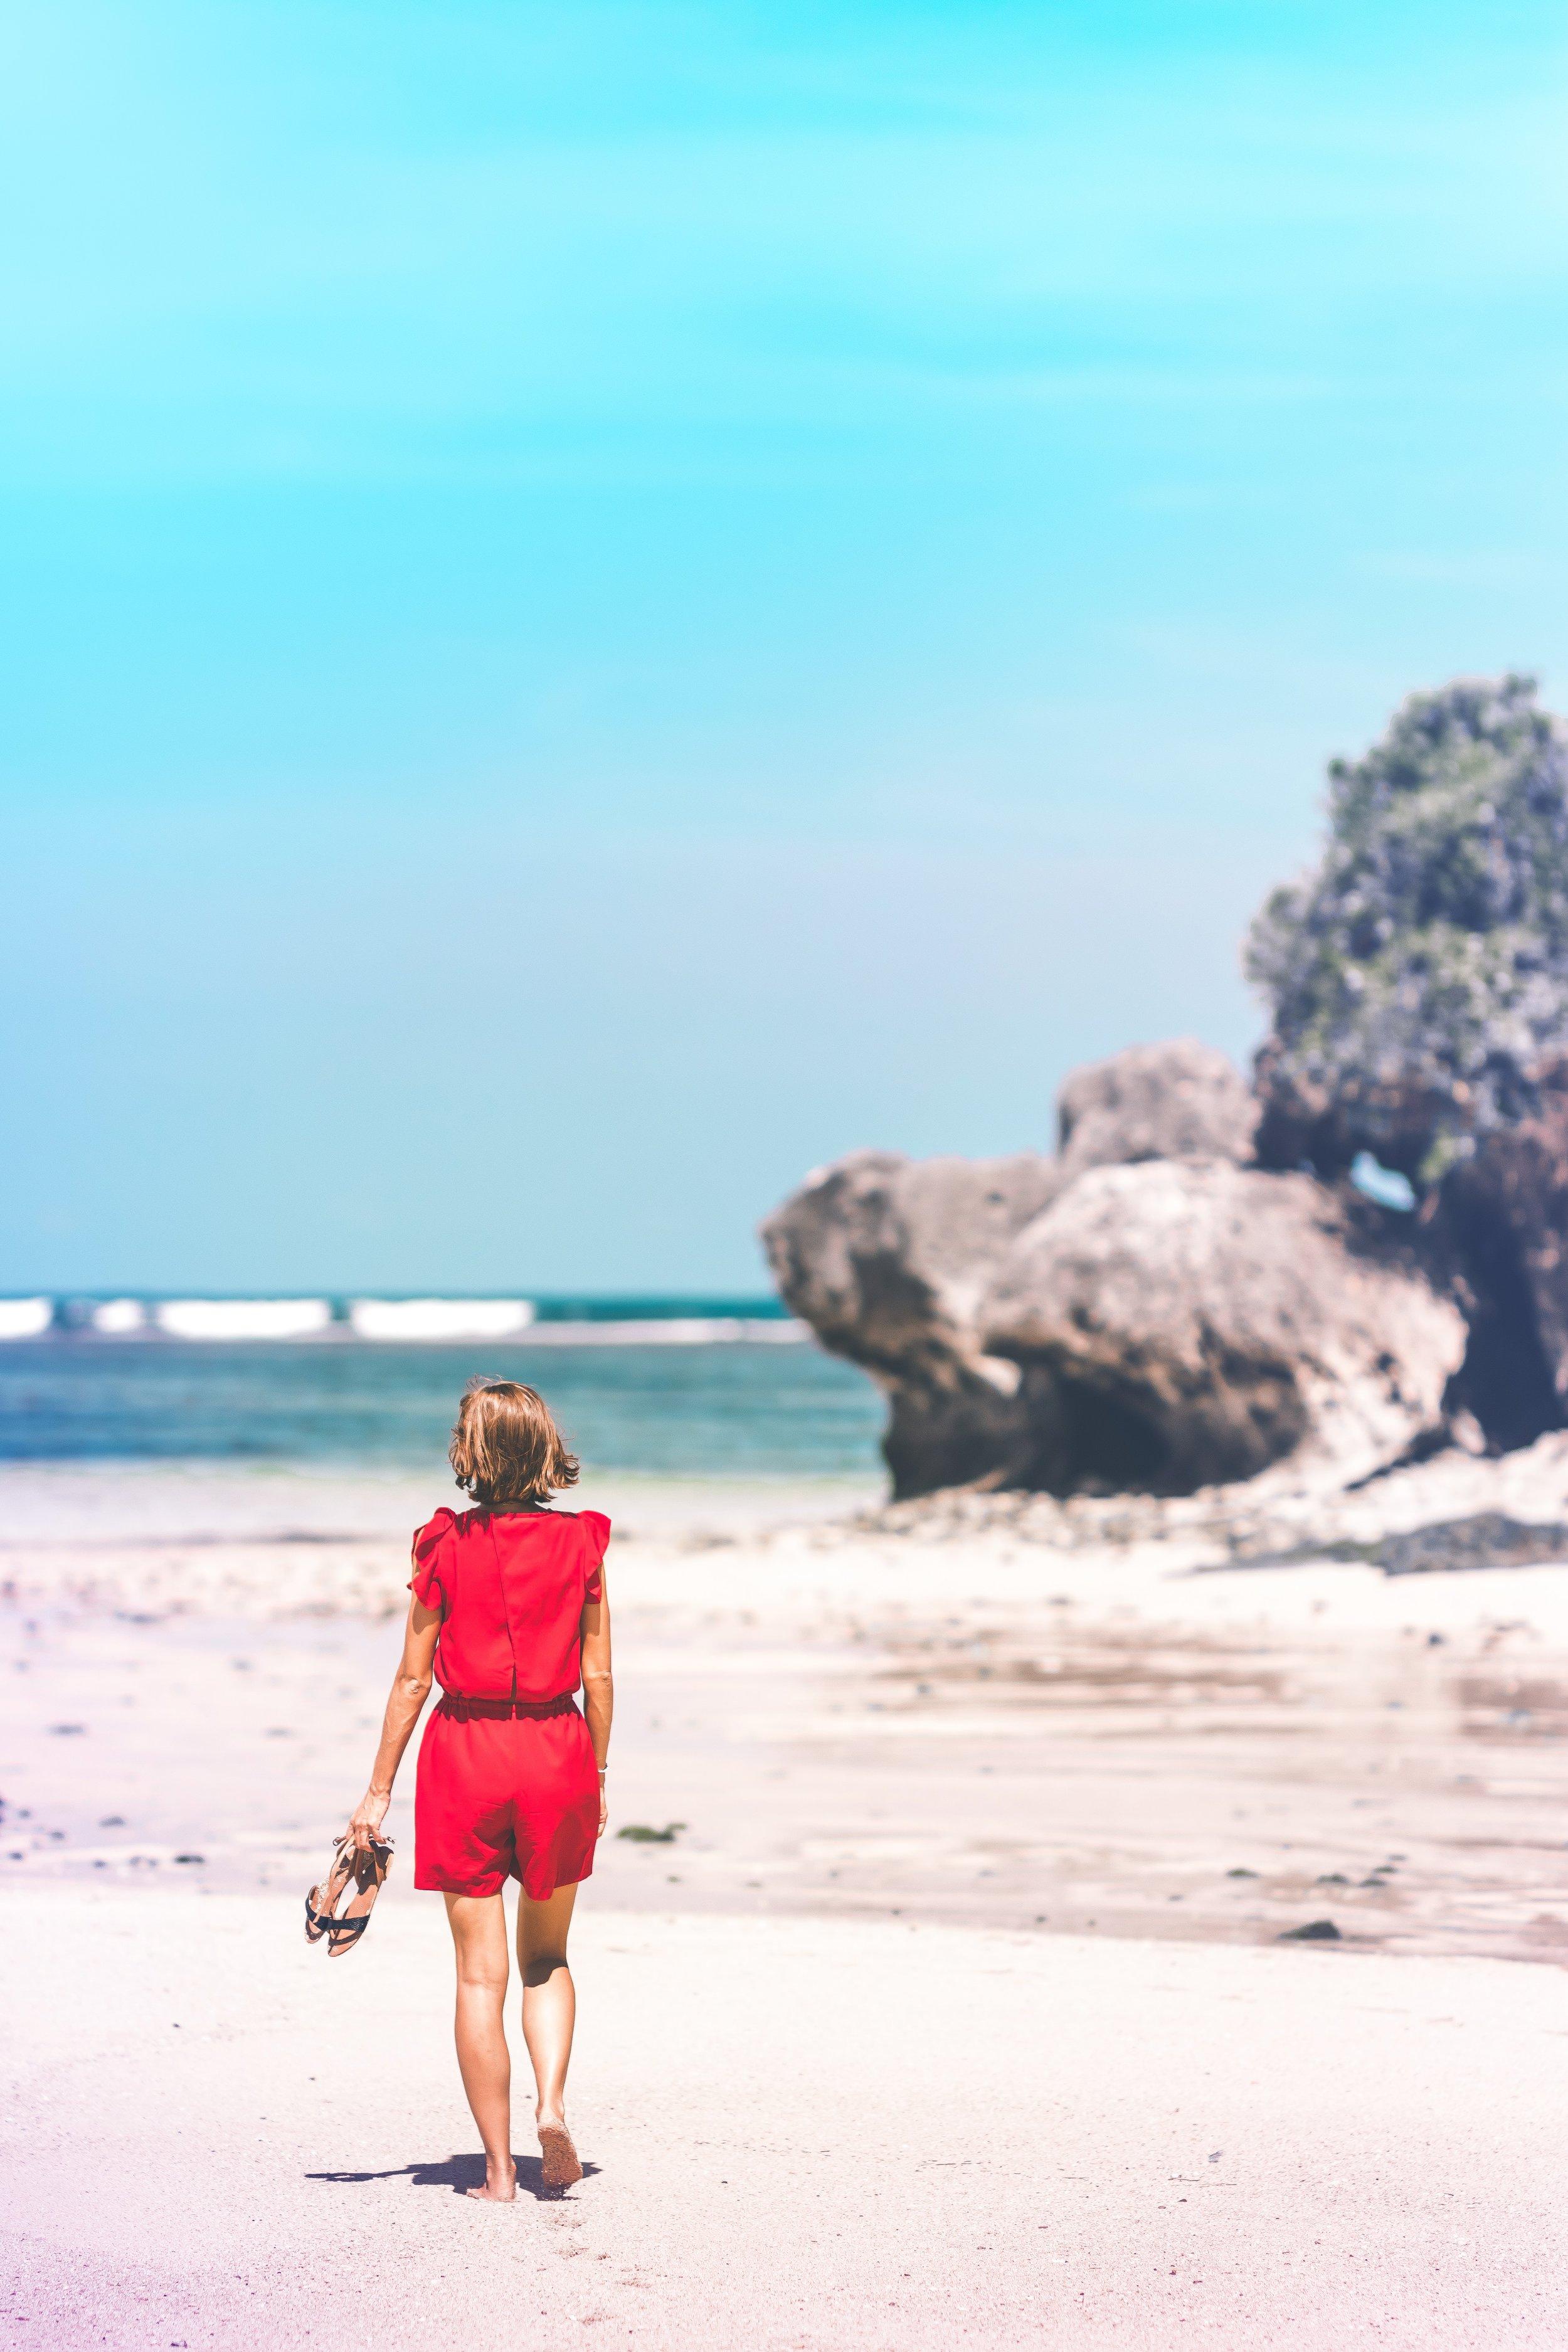 adult-barefoot-beach-1126037.jpg